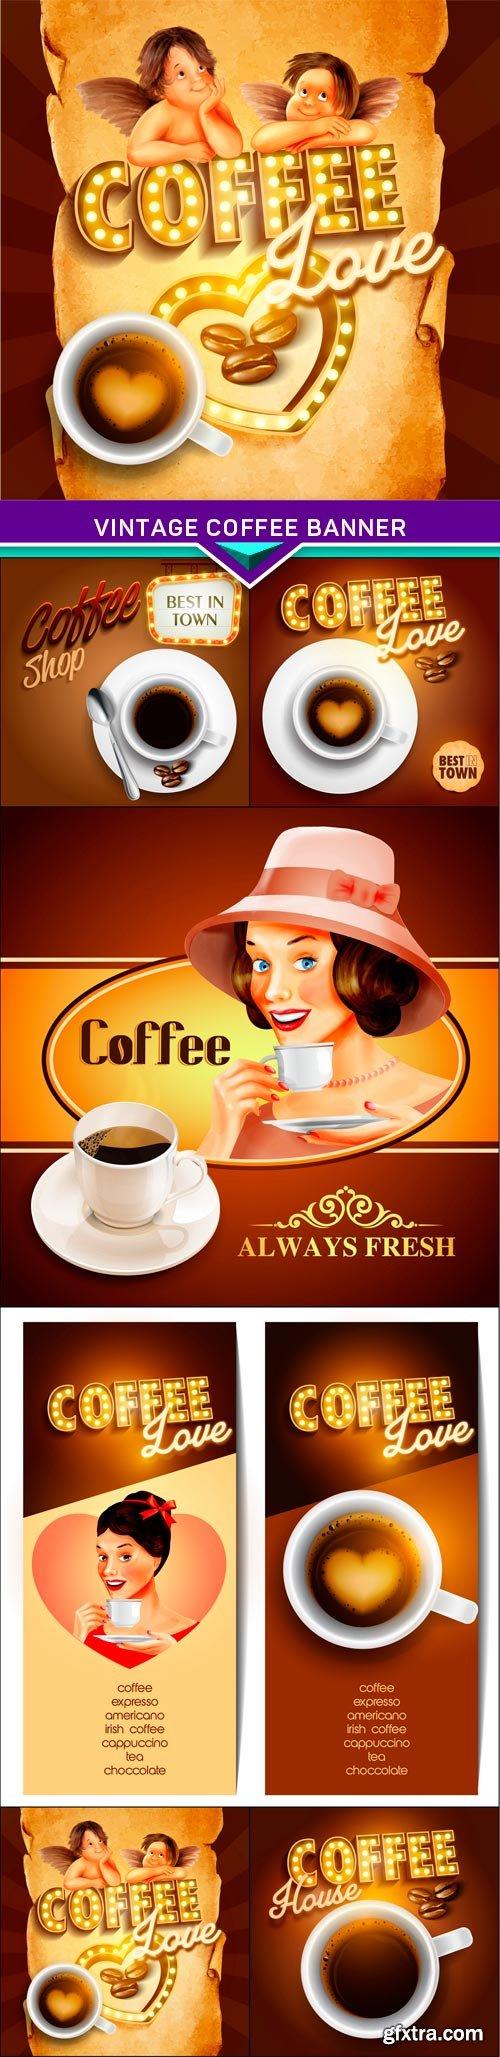 Vintage coffee banner 6x EPS